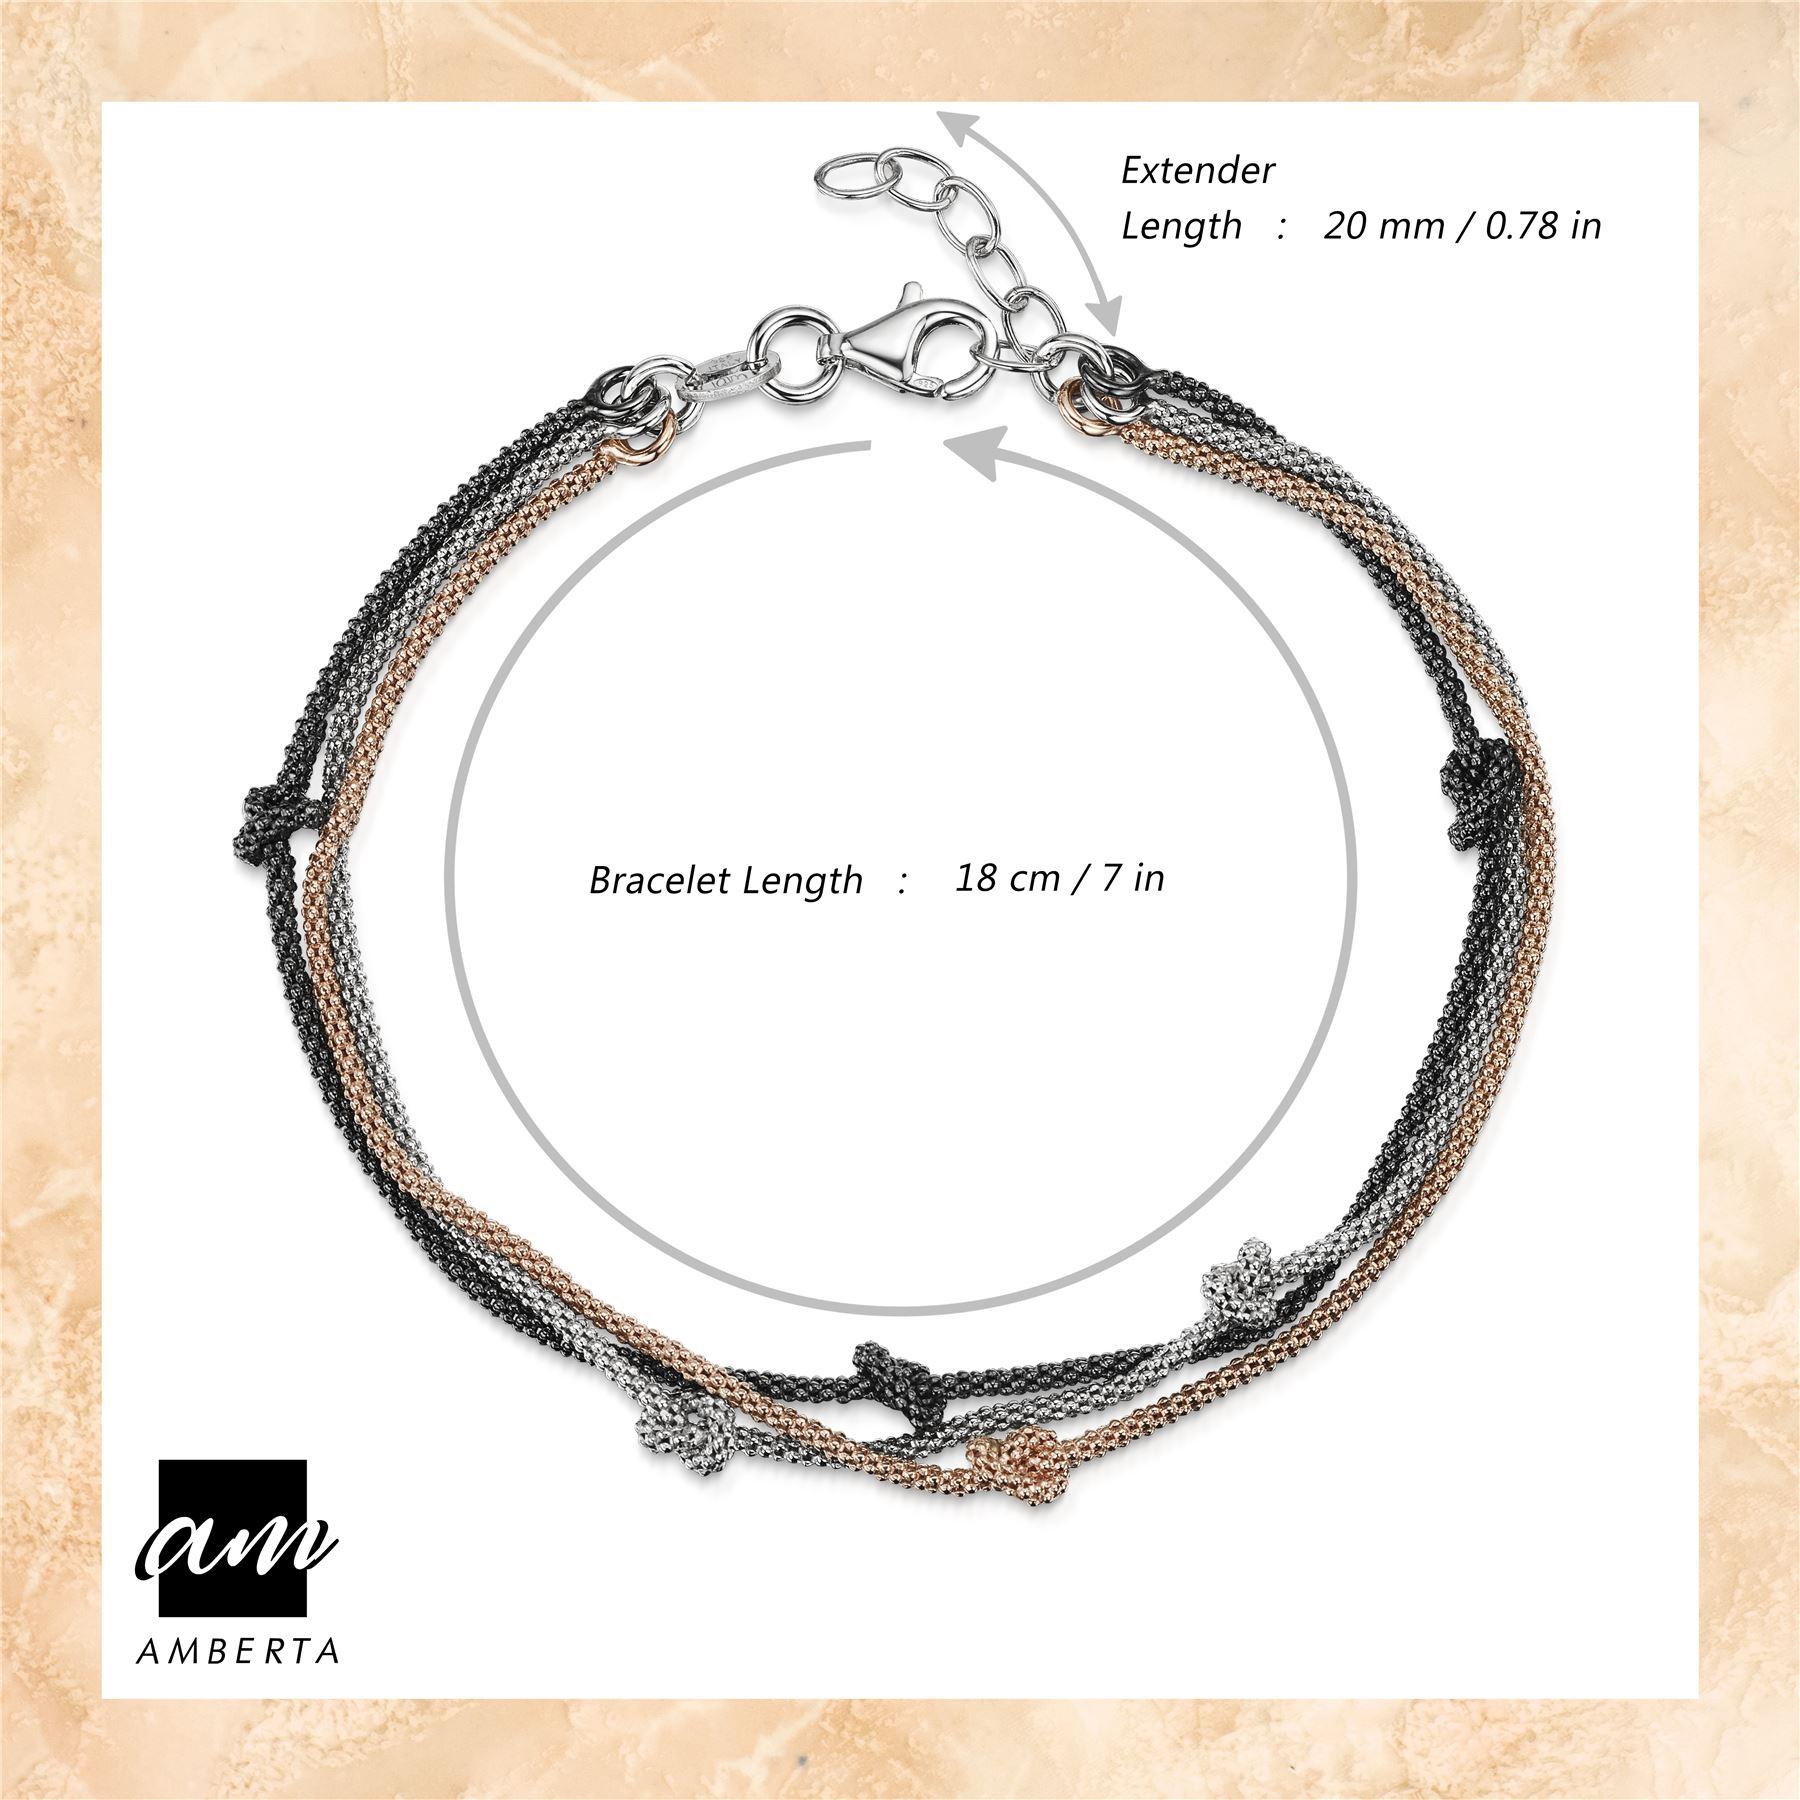 Amberta-925-Sterling-Silver-Adjustable-Multi-Layered-Chain-Bracelet-for-Women miniature 8